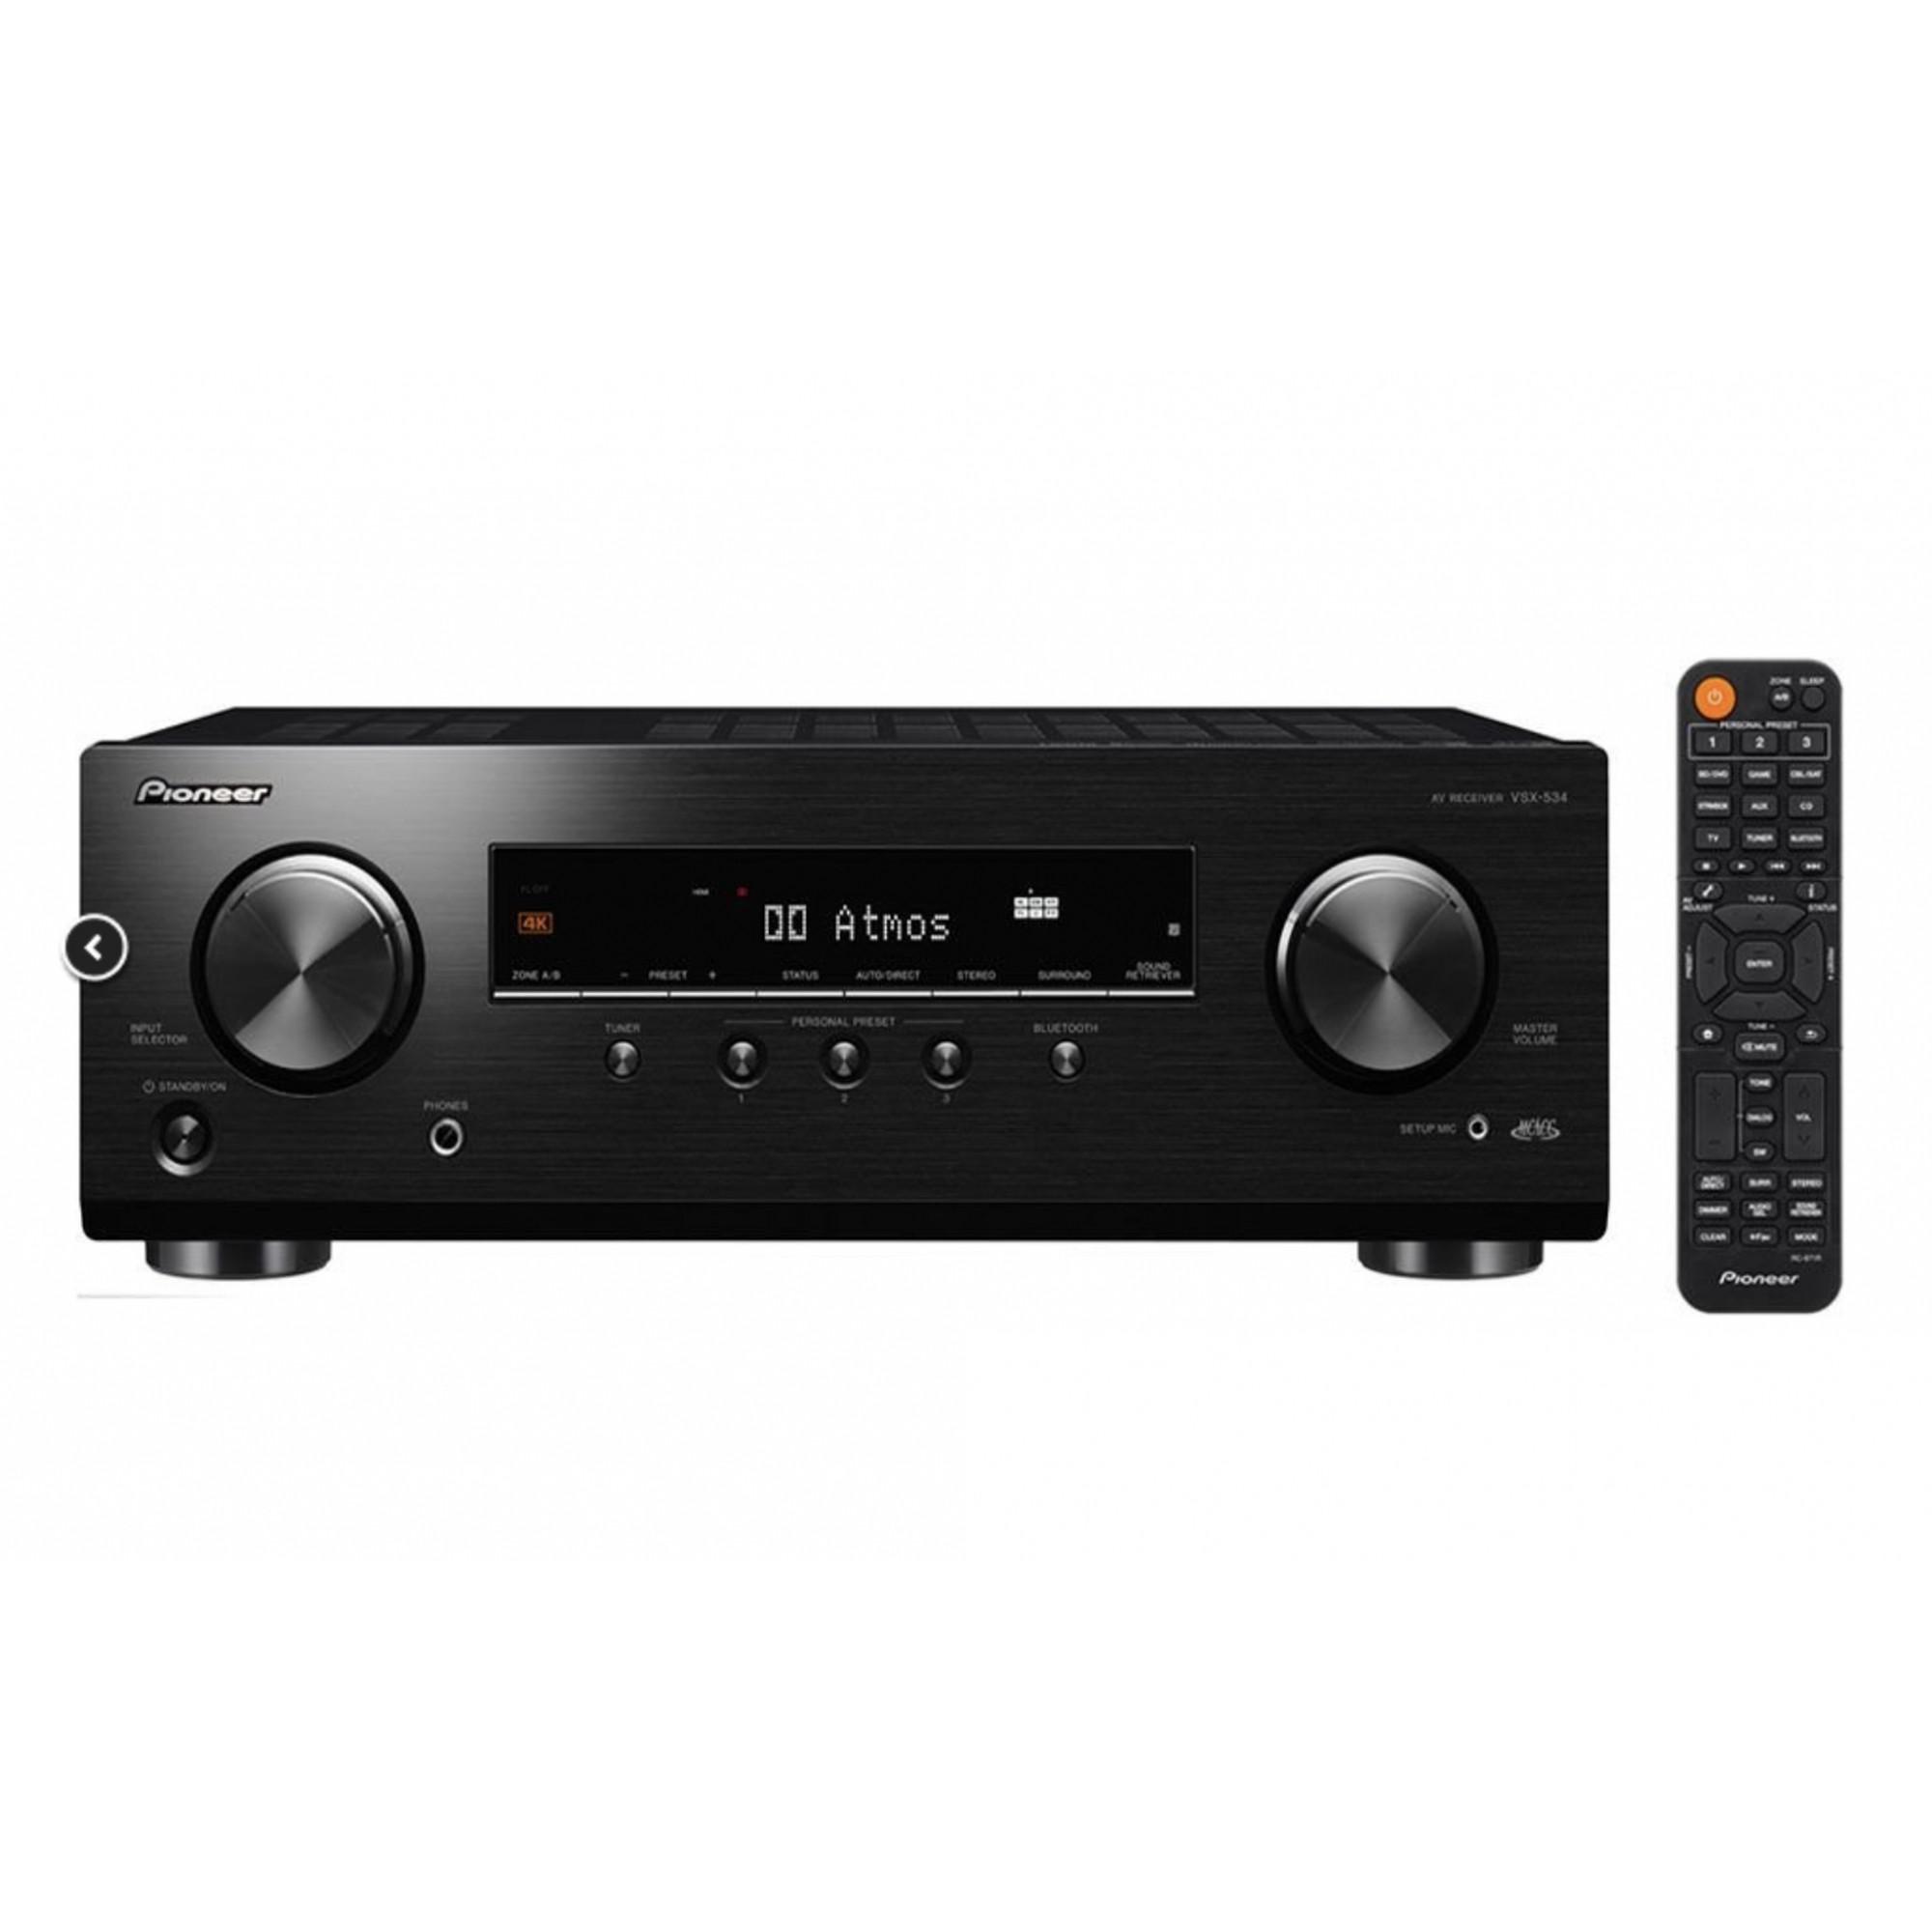 Pioneer Vsx-534 - Receiver 5.2 Canais Dolby Atmos 4K Ultra HD 80 W - 110v